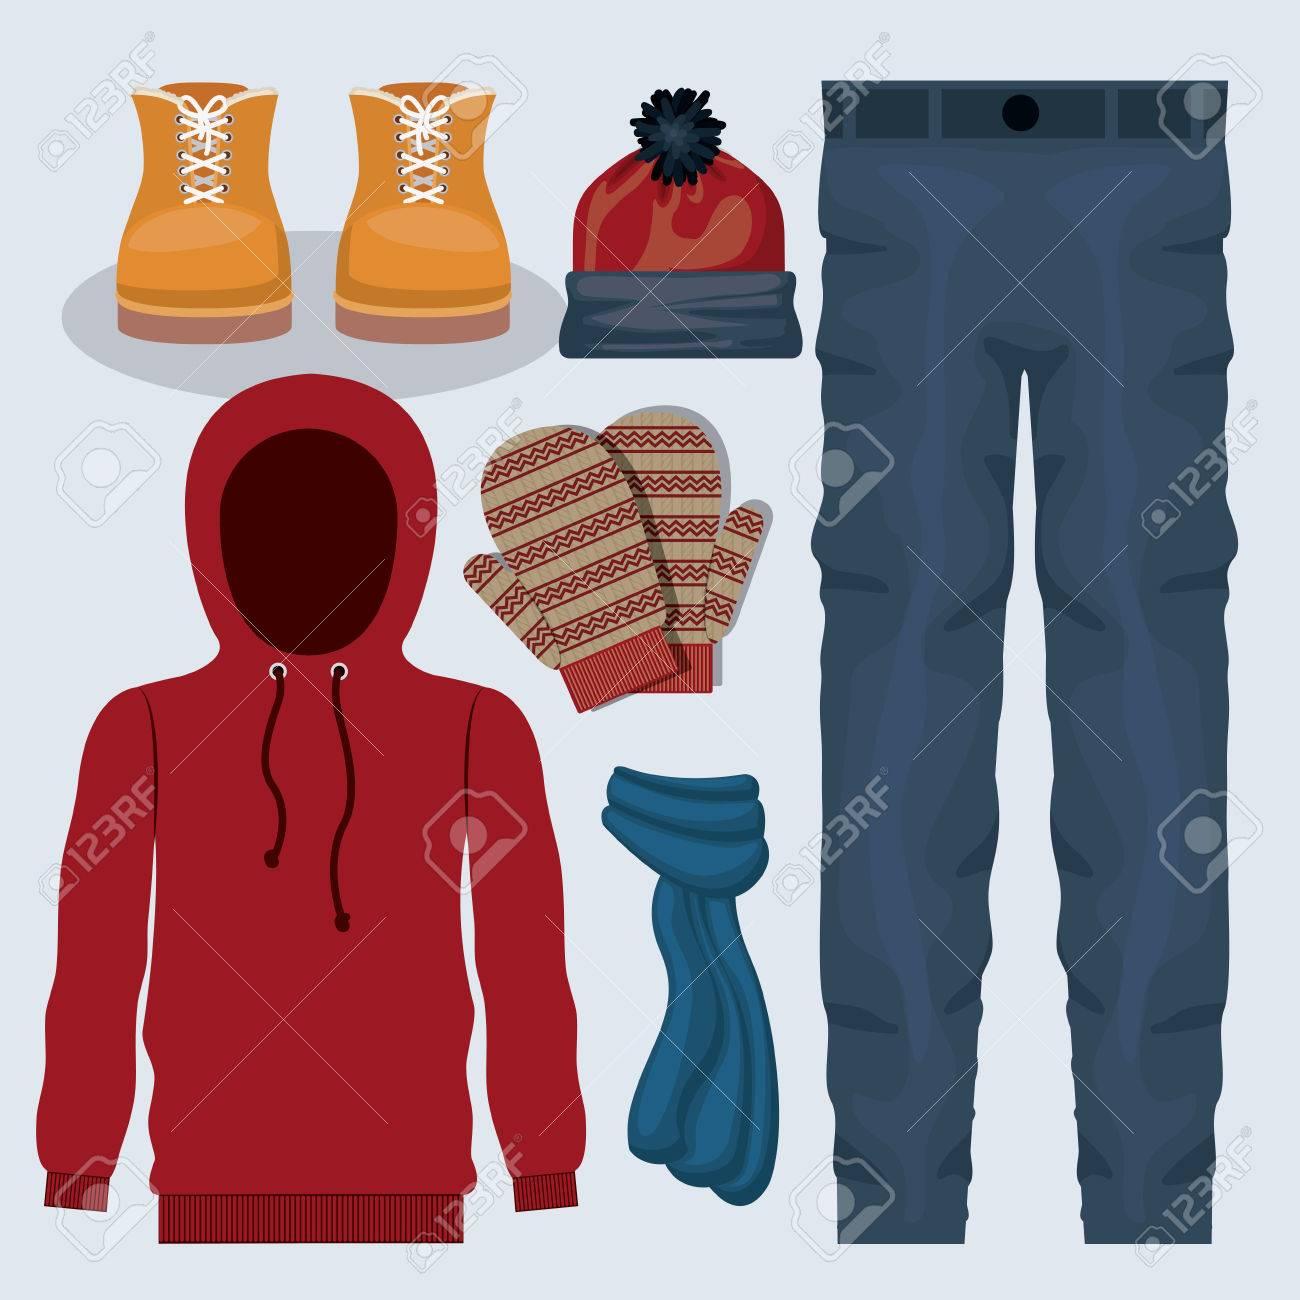 winter clothing design illustration graphic - 49107047